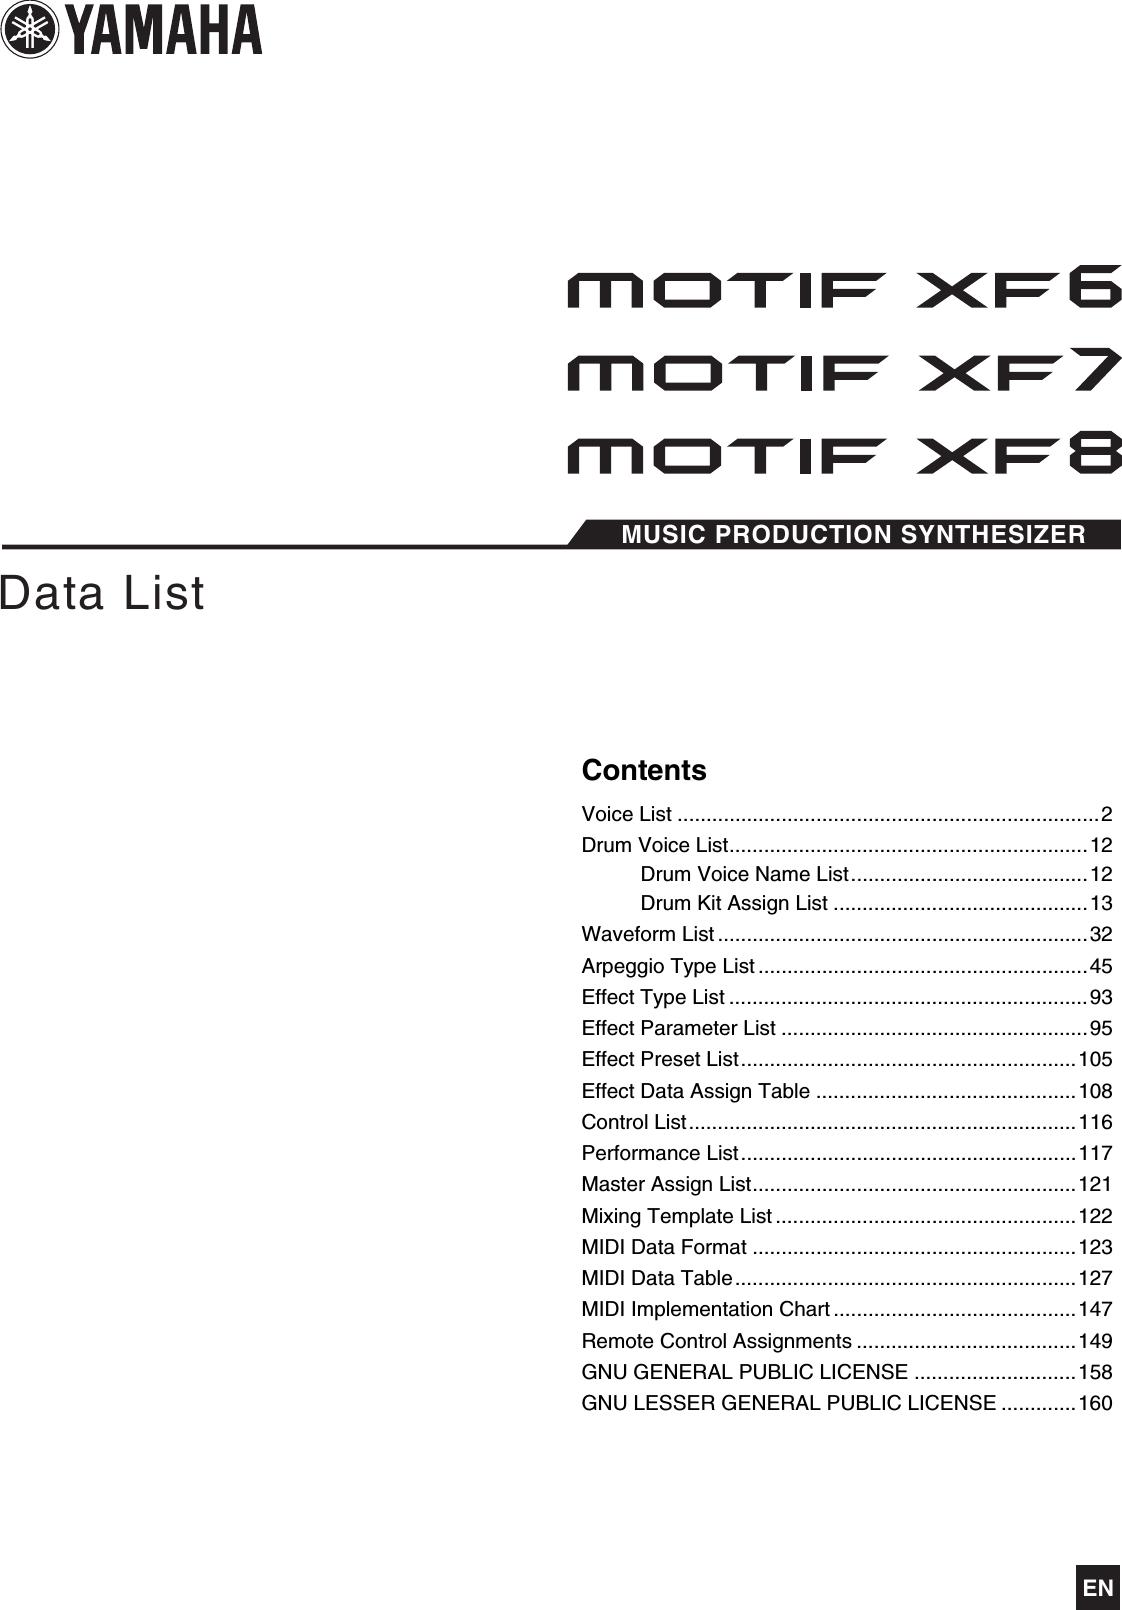 motifxfendlc0 User Guide Page 1